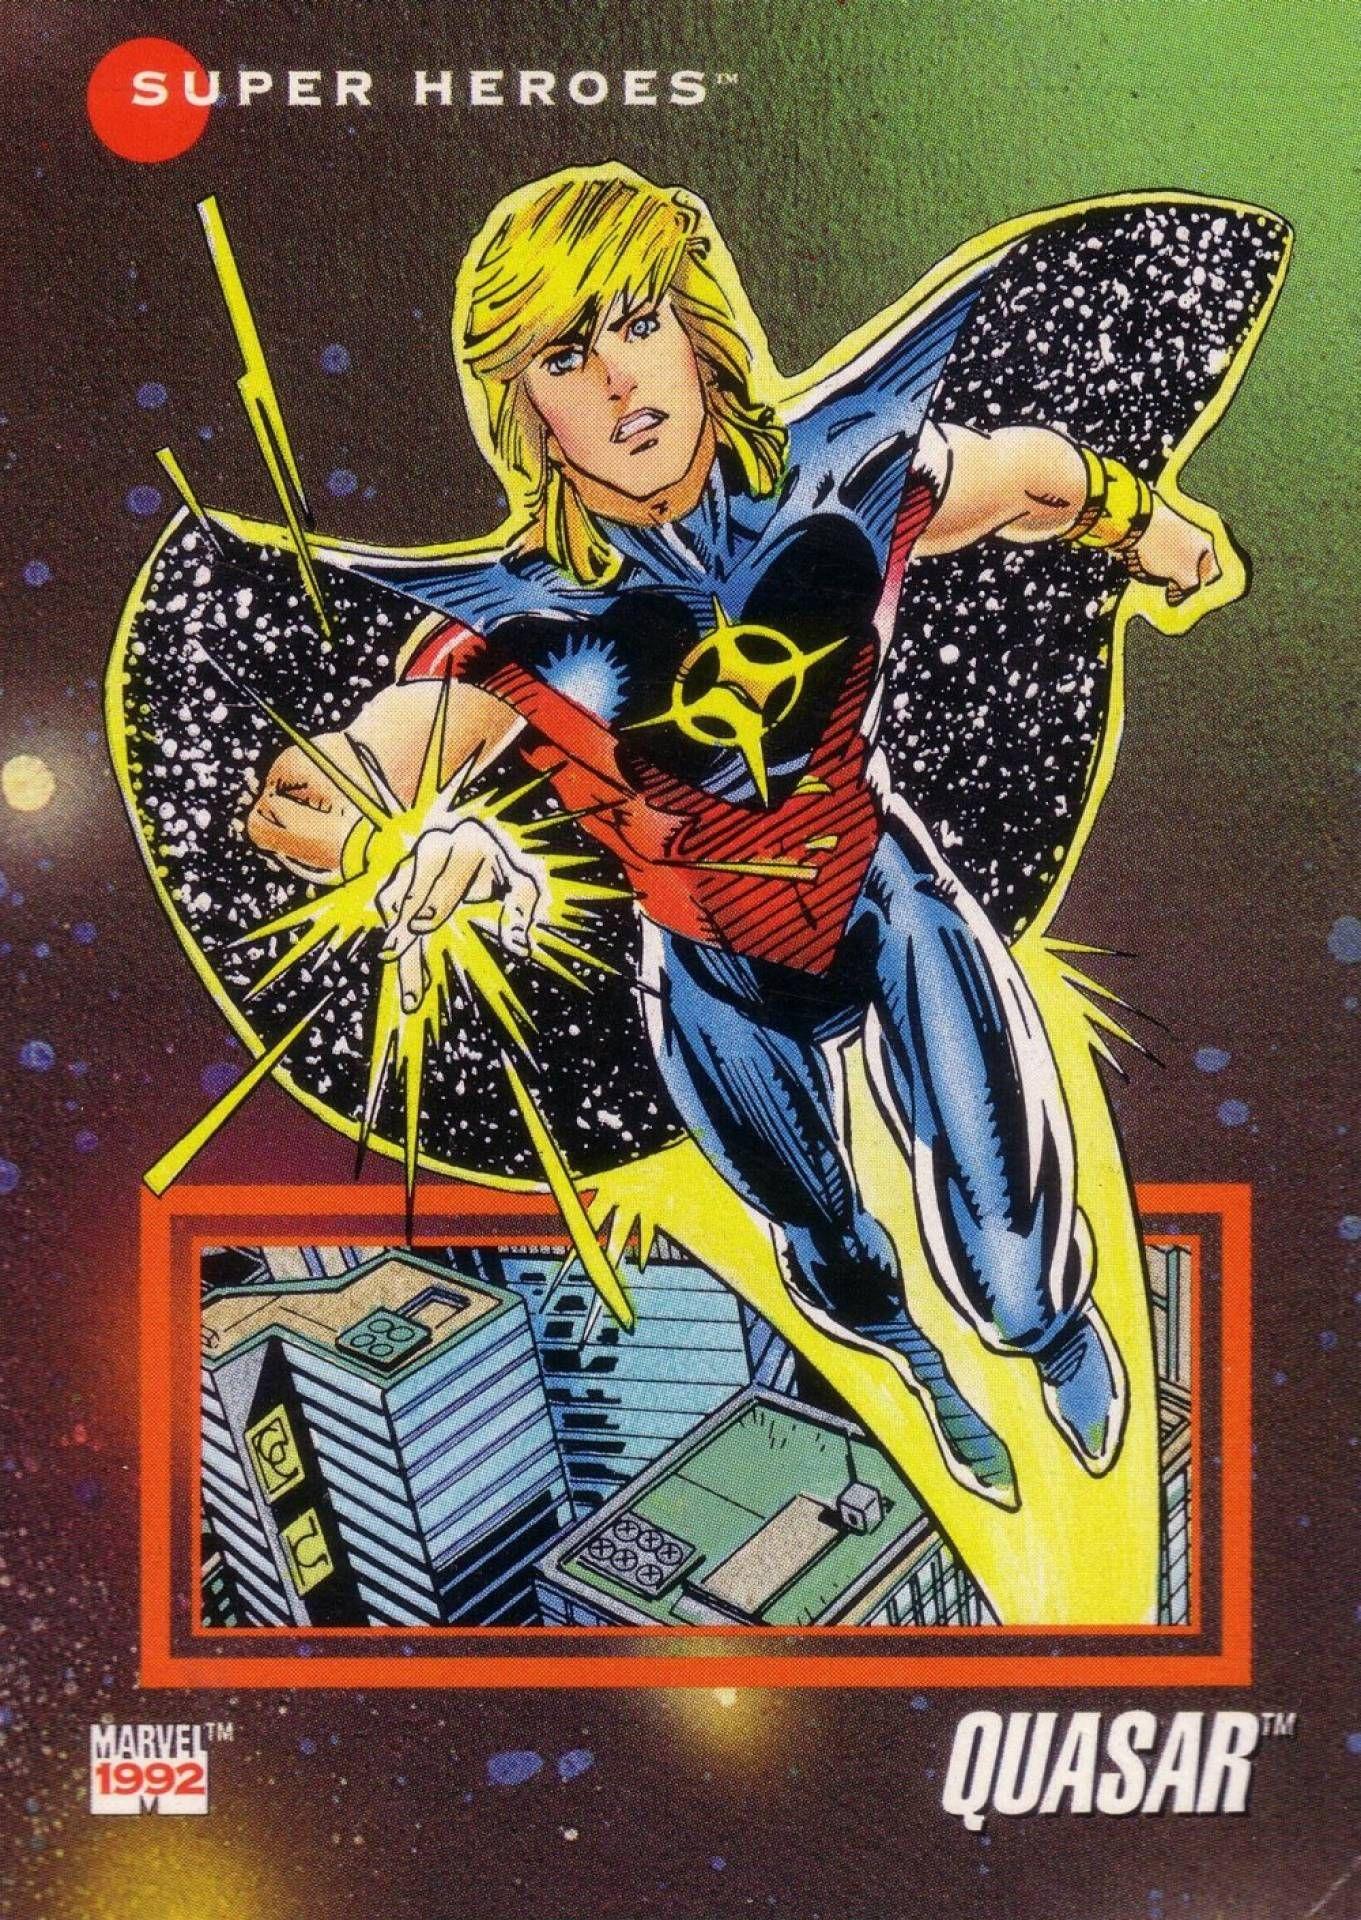 Quasar Marvel